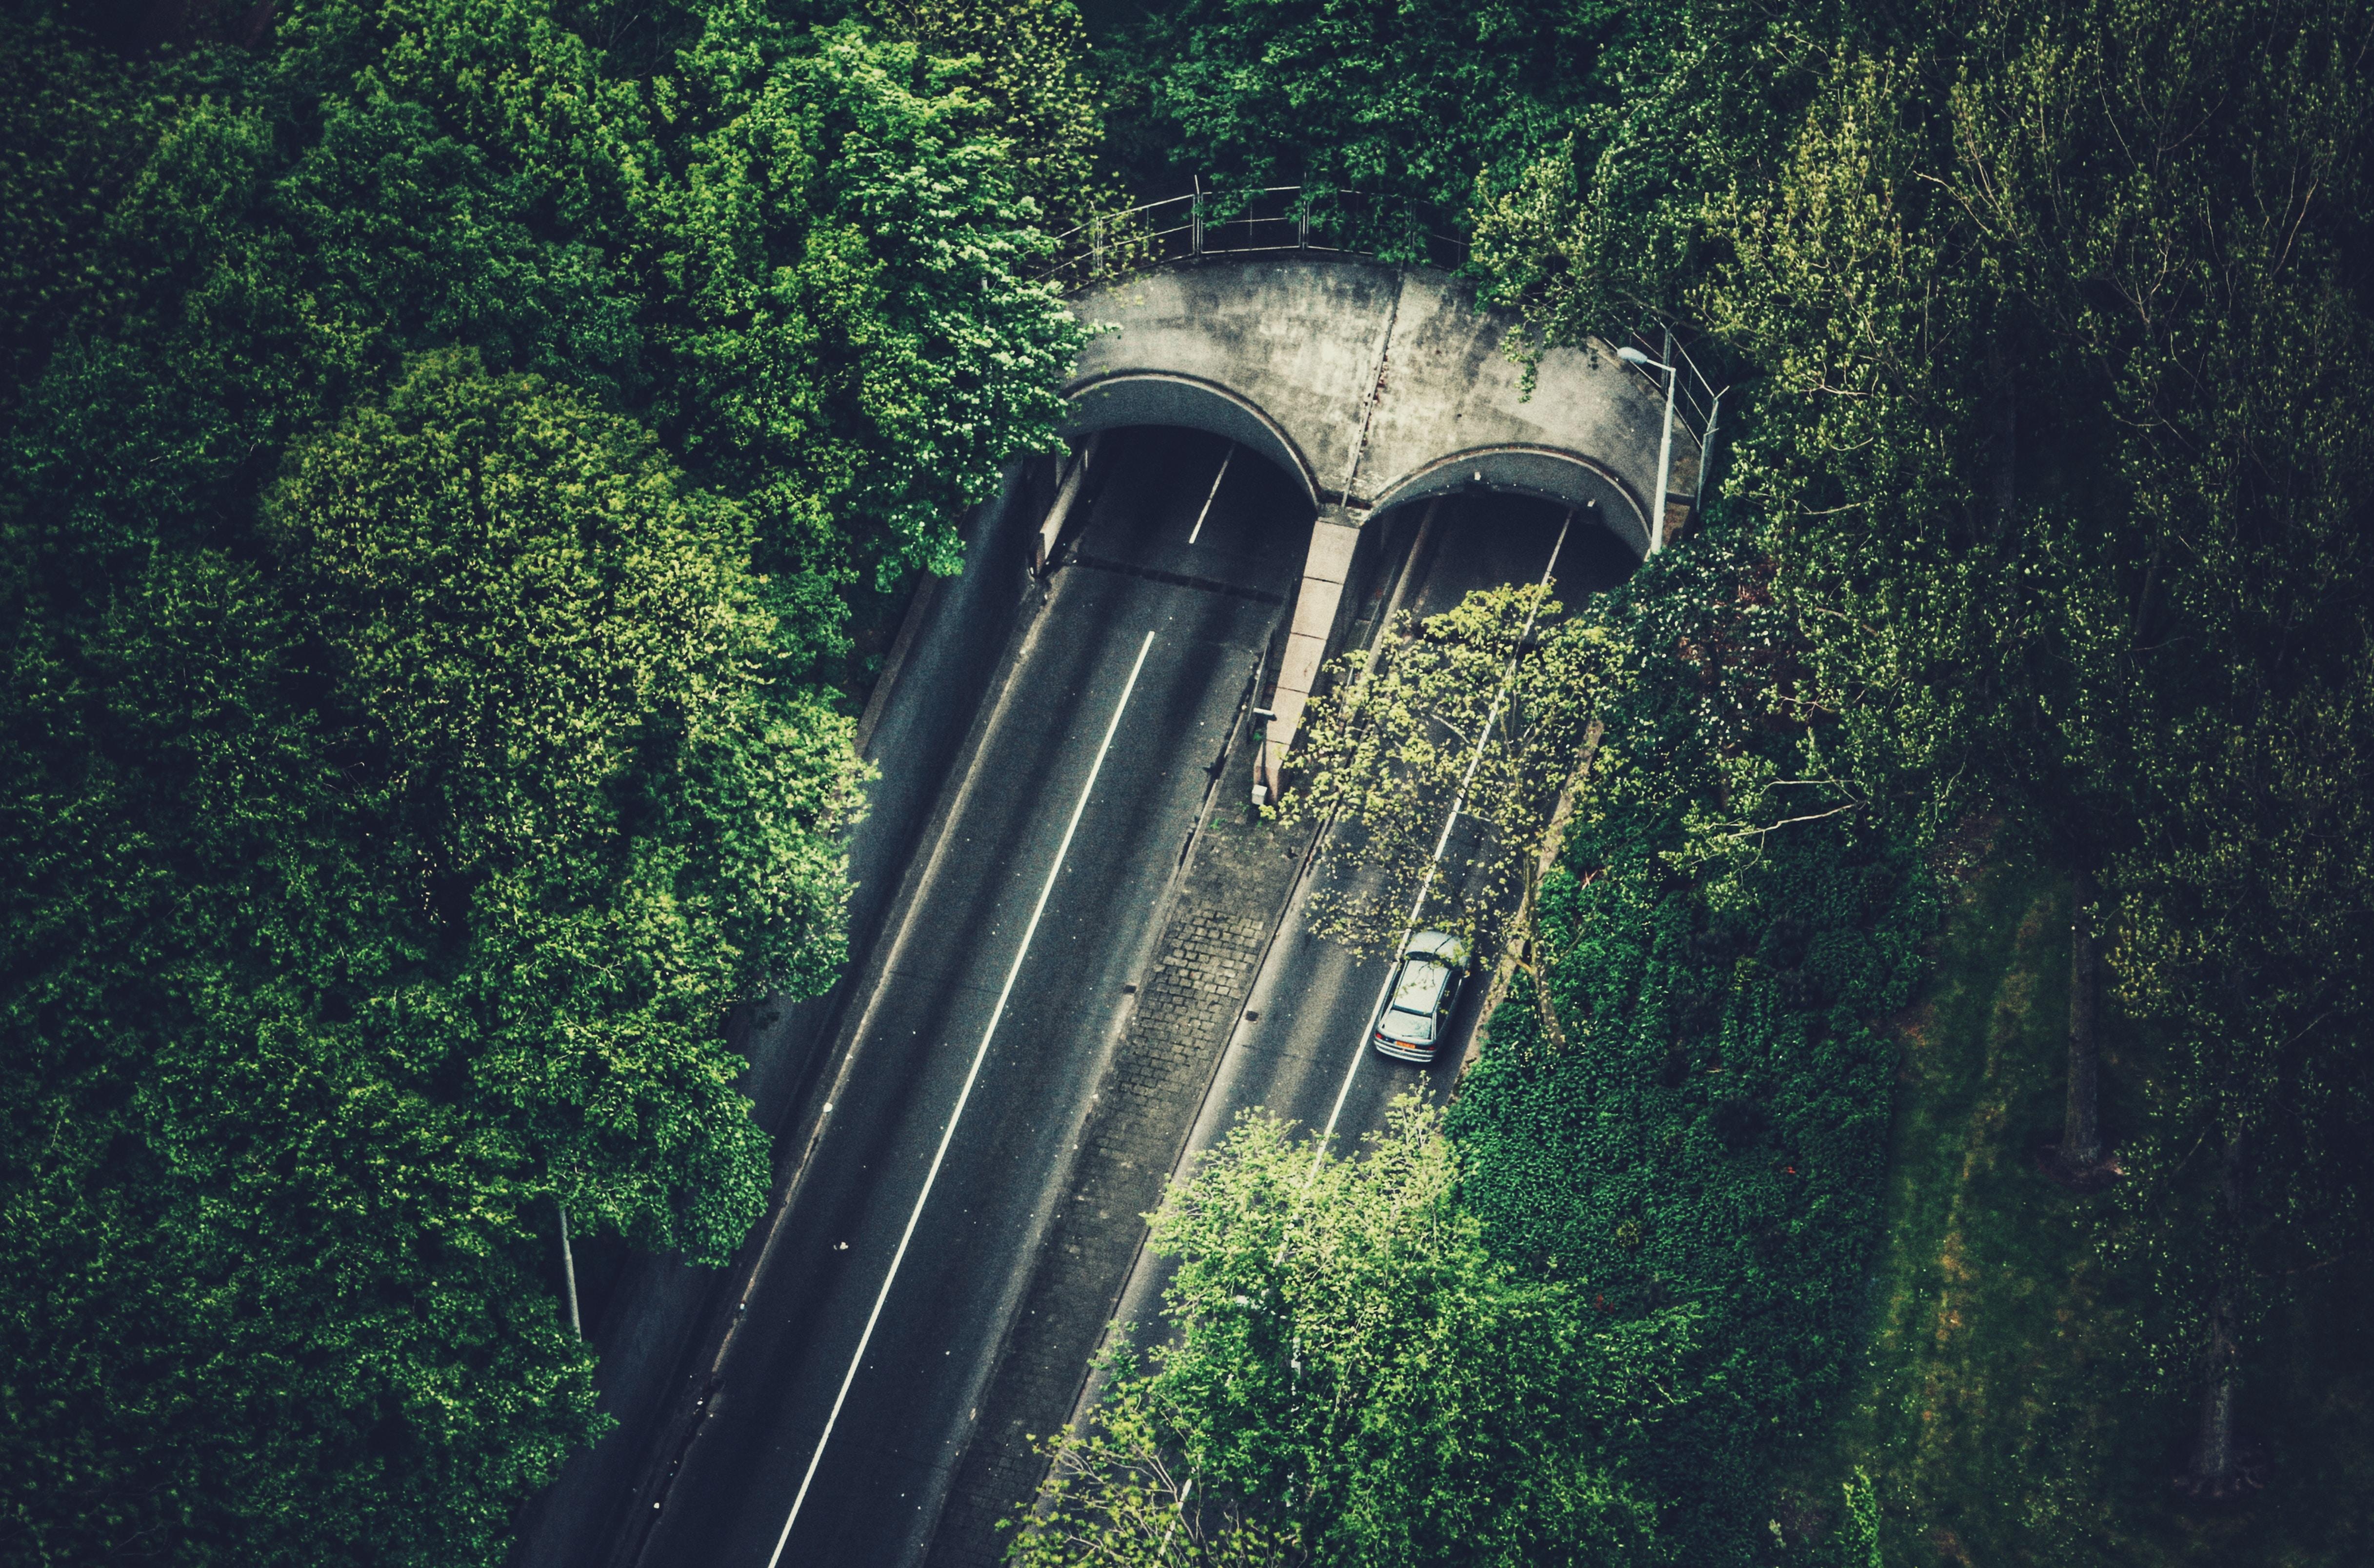 bird's eye view of tunnel